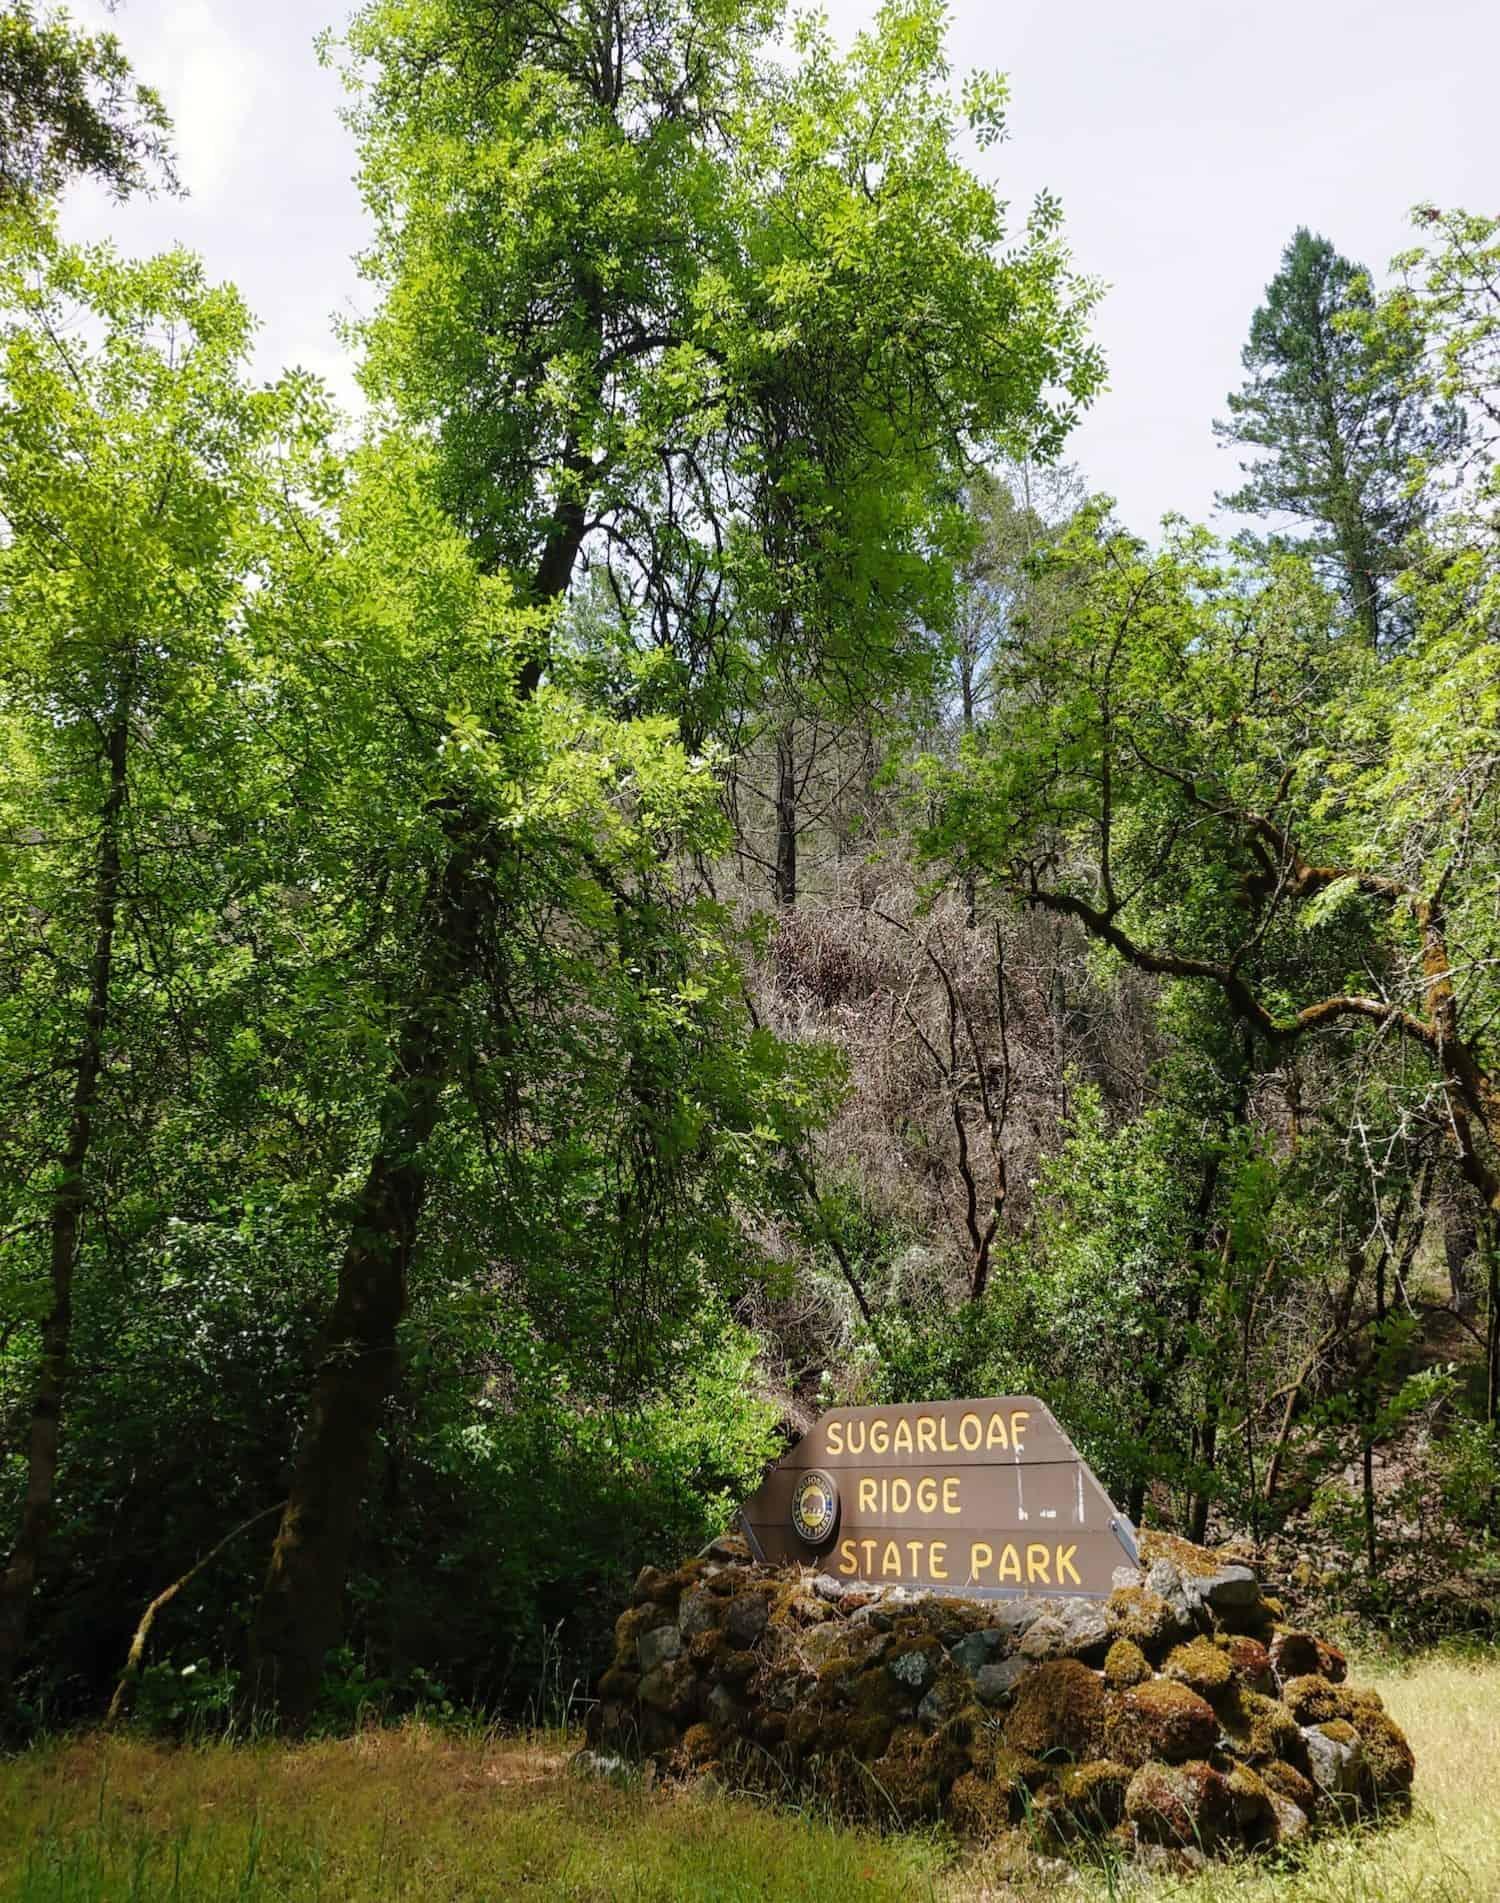 Santa Rosa - Sugarloaf Ridge State Park